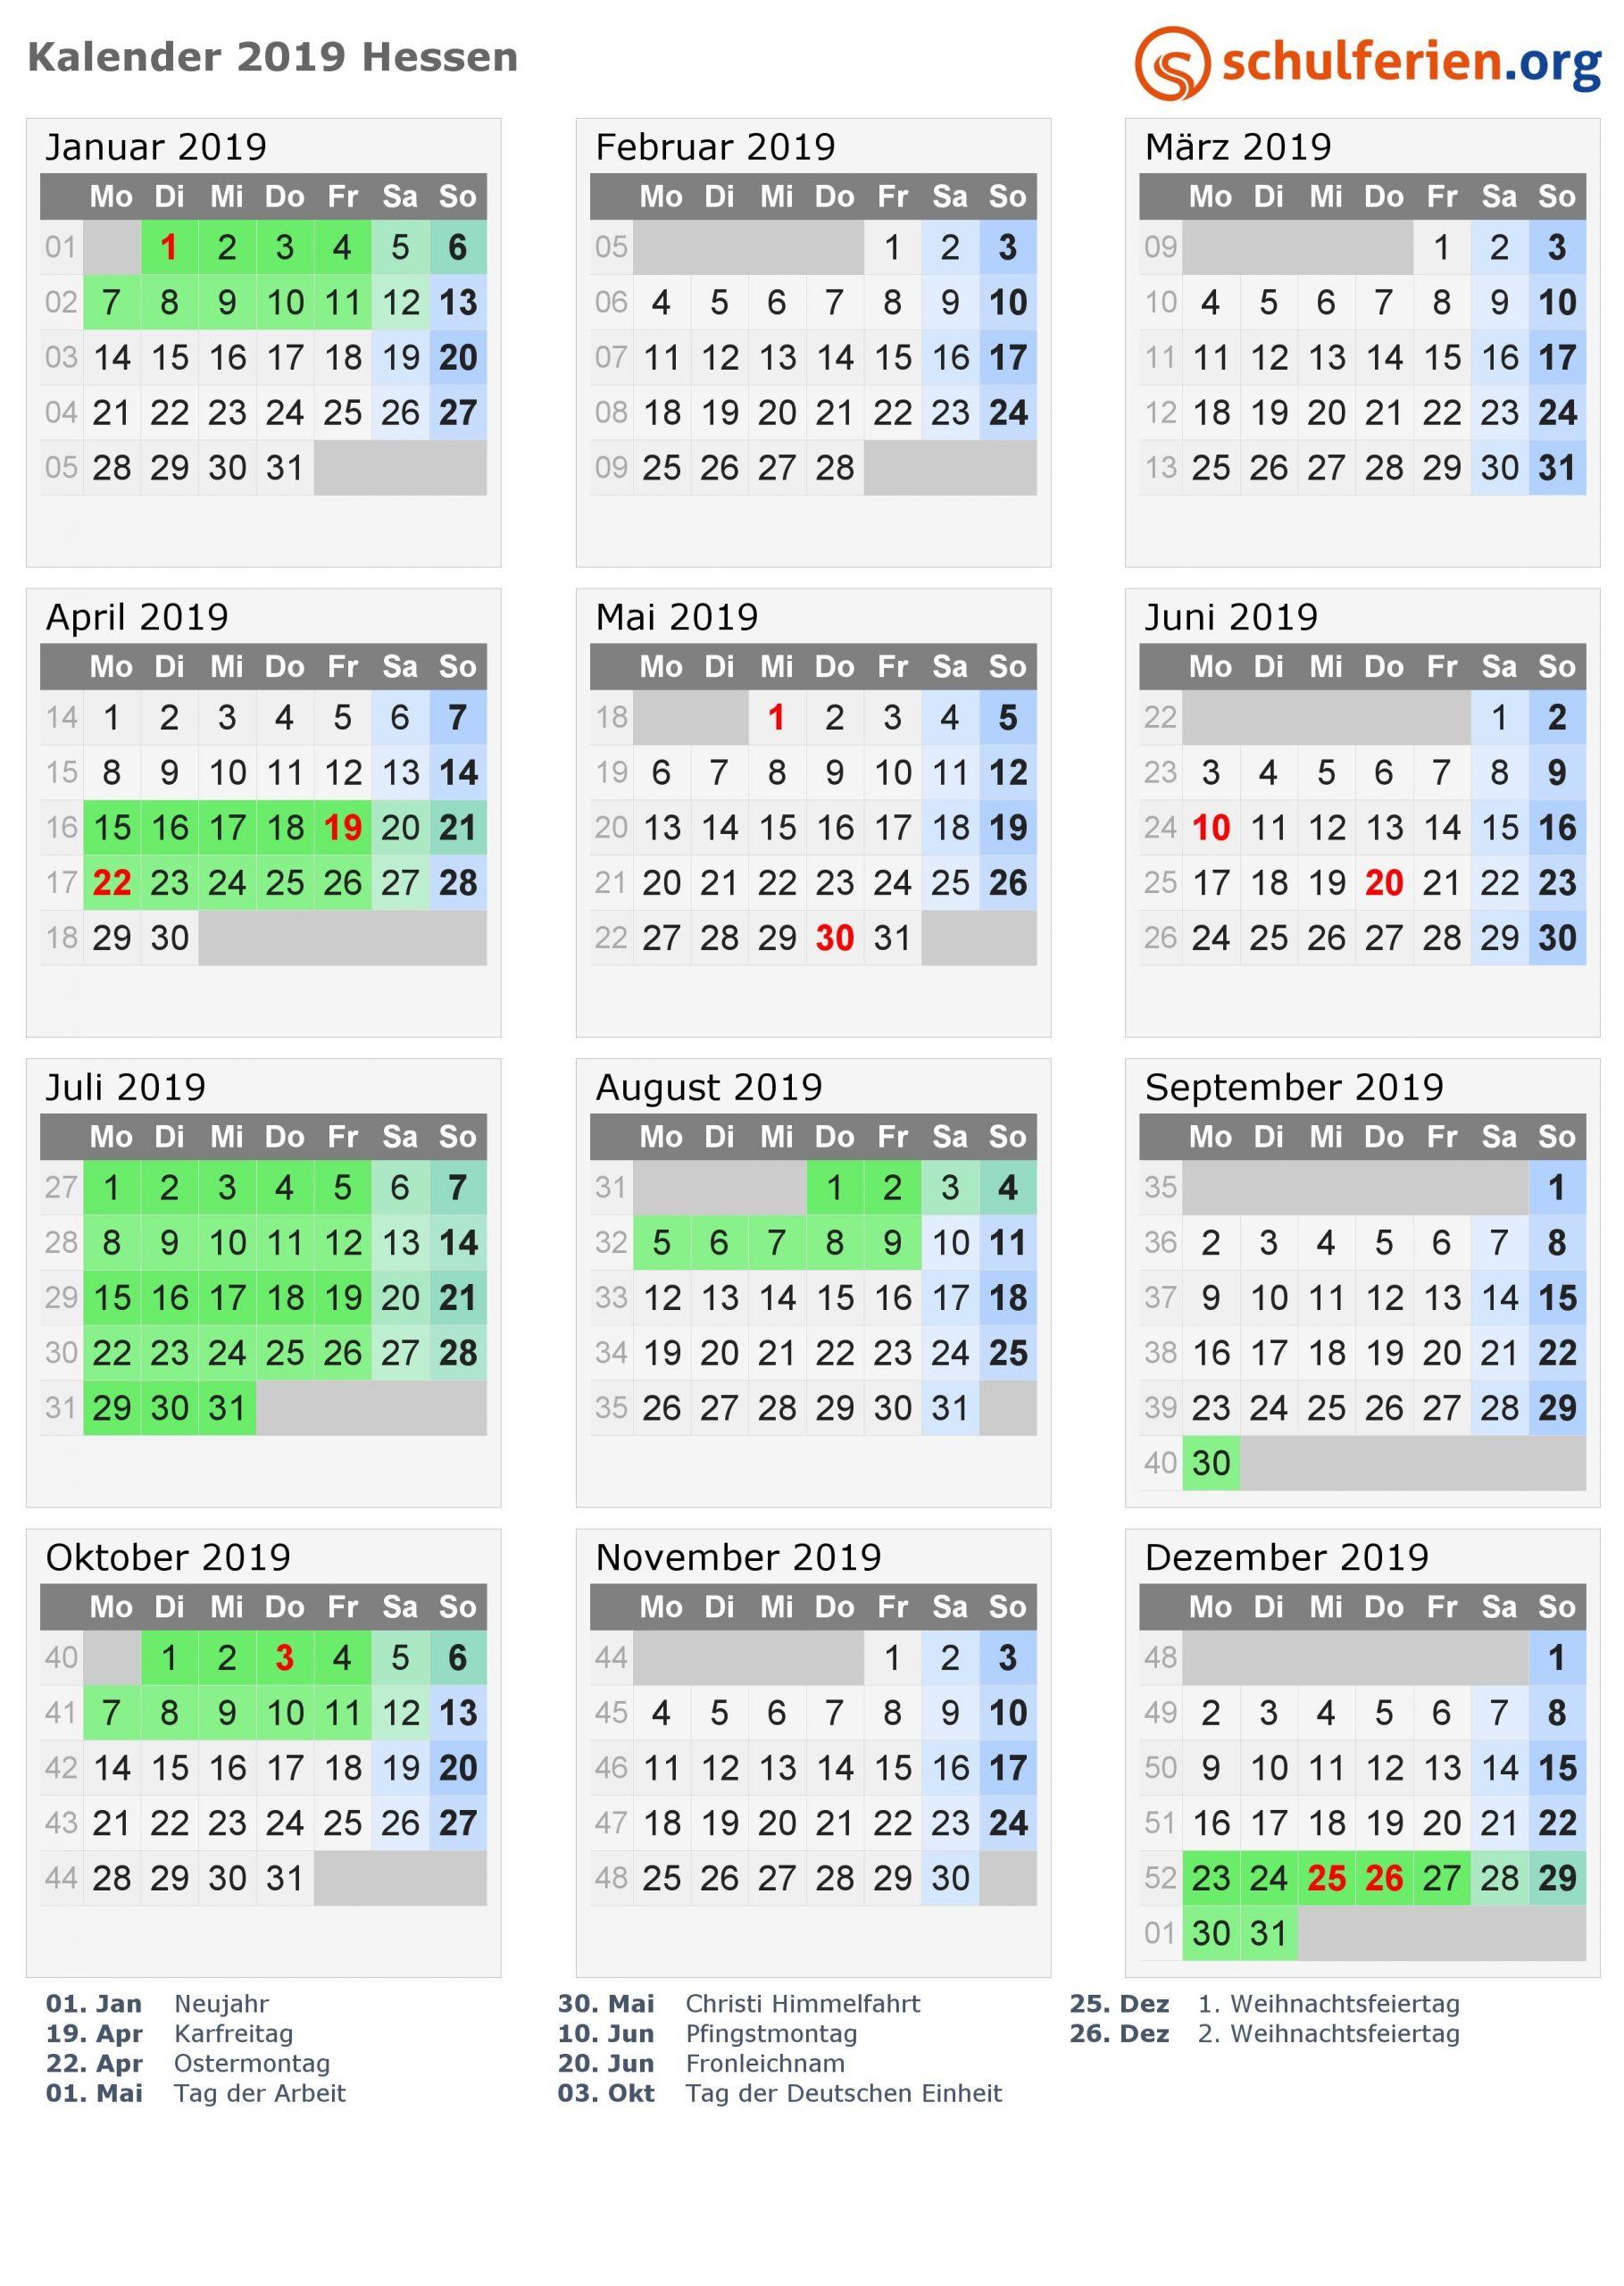 kalender januar 2019 pdf mas caliente kalender 2019 ferien hessen feiertage of kalender januar 2019 pdf